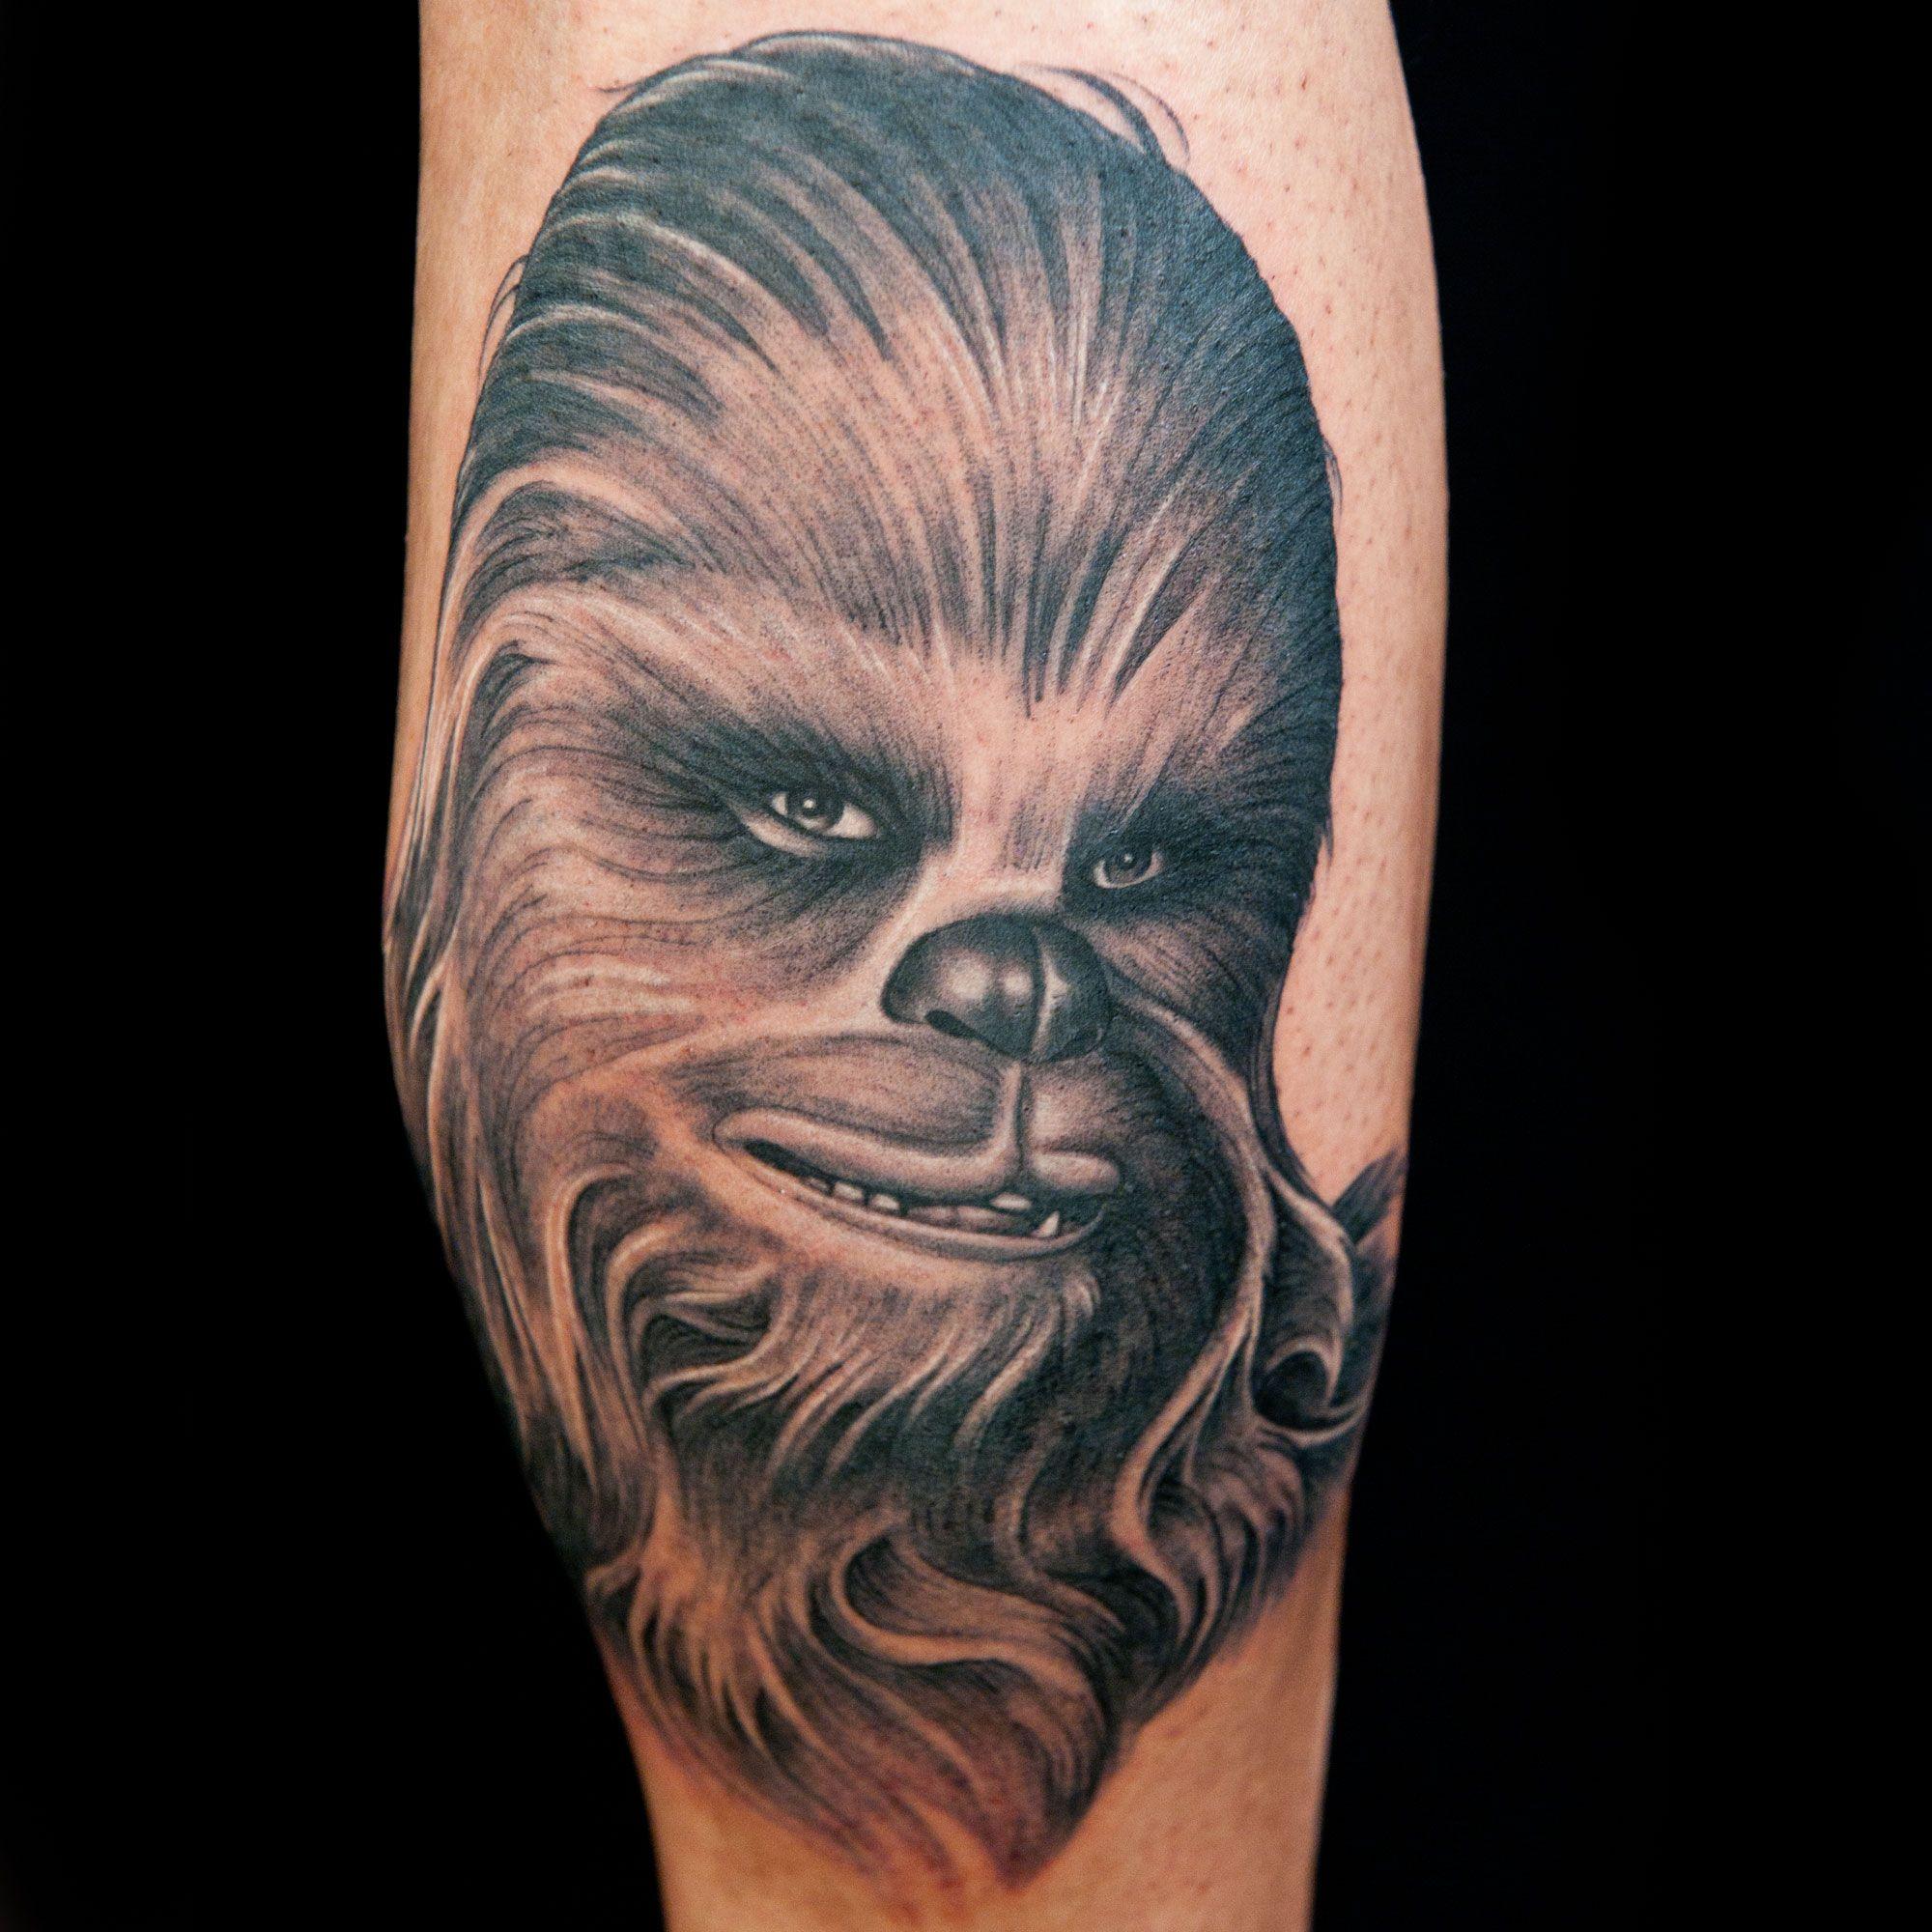 30 Chewbacca Tattoo Designs For Men – Star Wars Ink Ideas foto